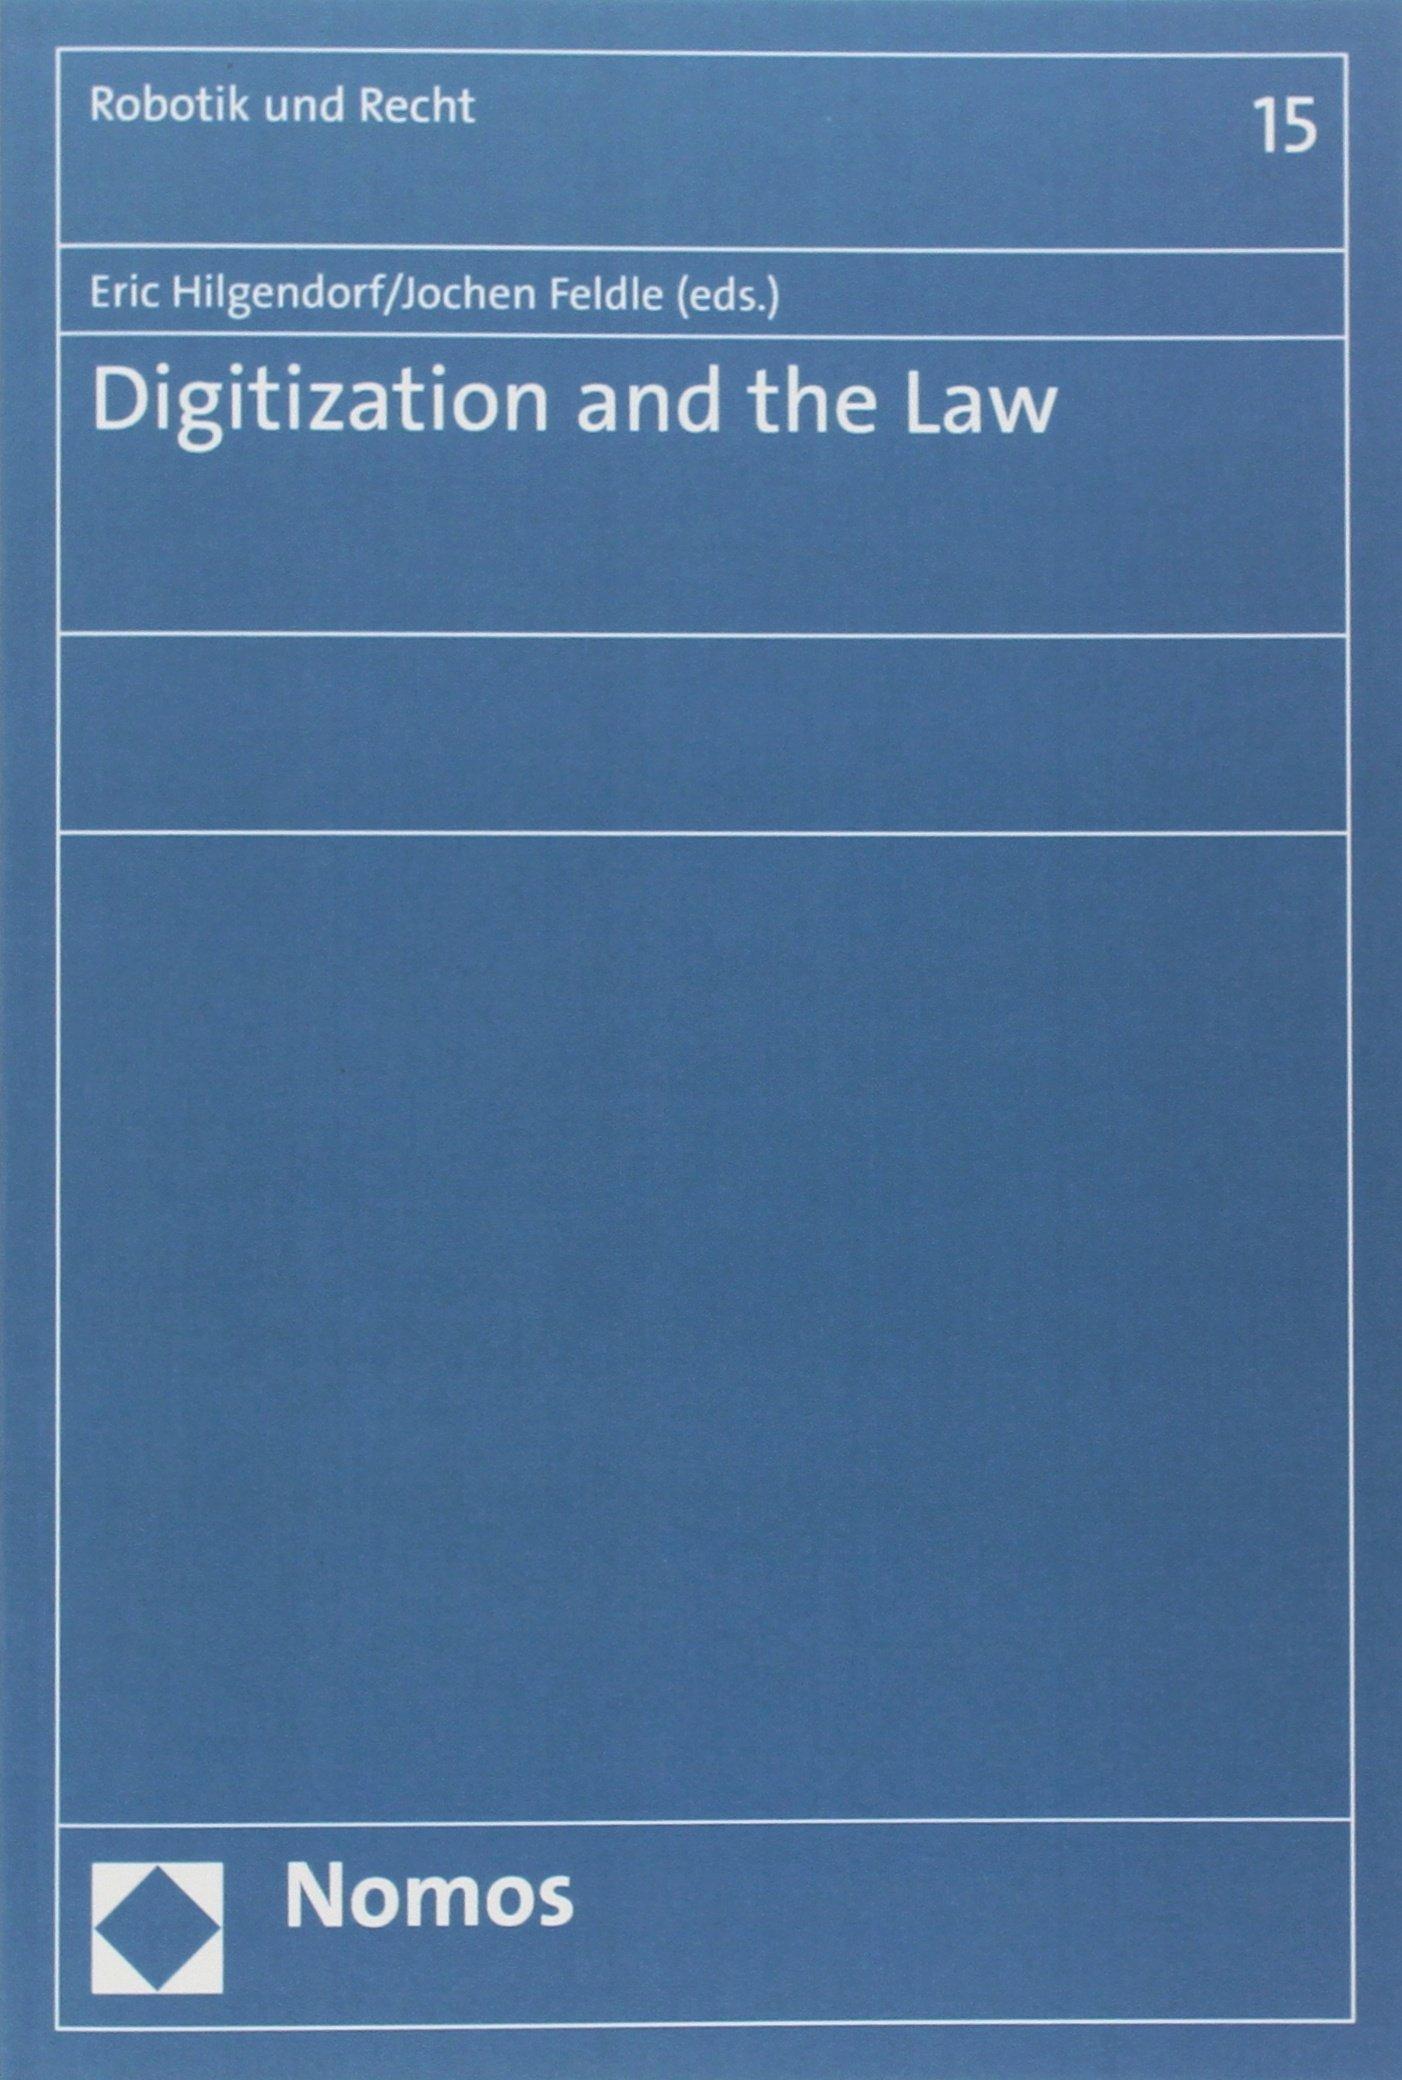 Read Online Digitization and the Law edited by Eric Hilgendorf and Jochen Feldle (Robotik Und Recht) ebook